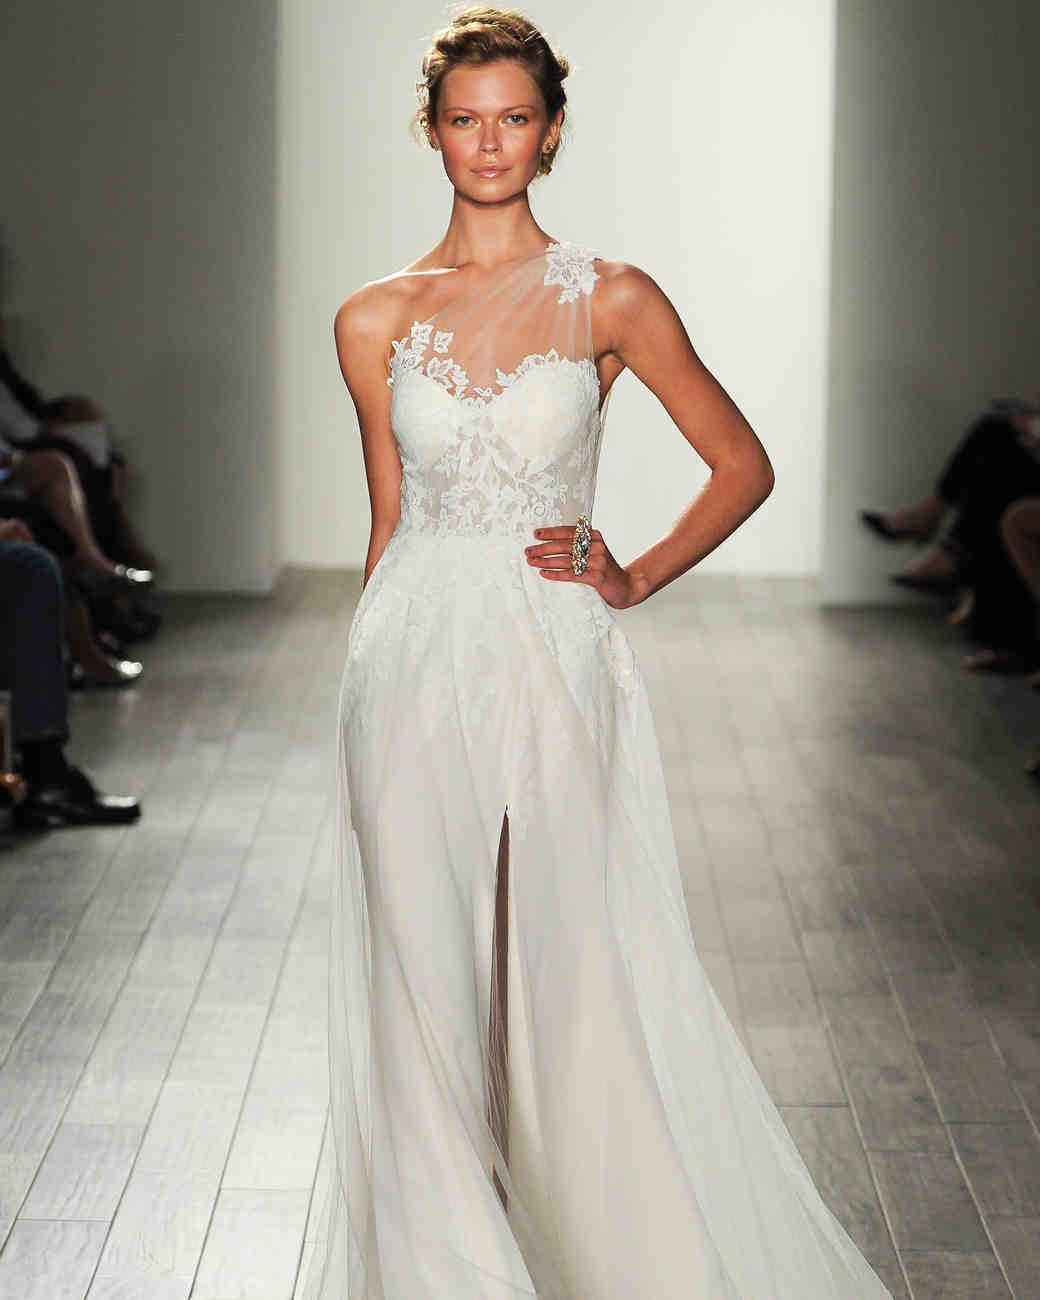 Jim Heljm Wedding Dresses.Jim Hjelm Wedding Dresses Fashion Dresses